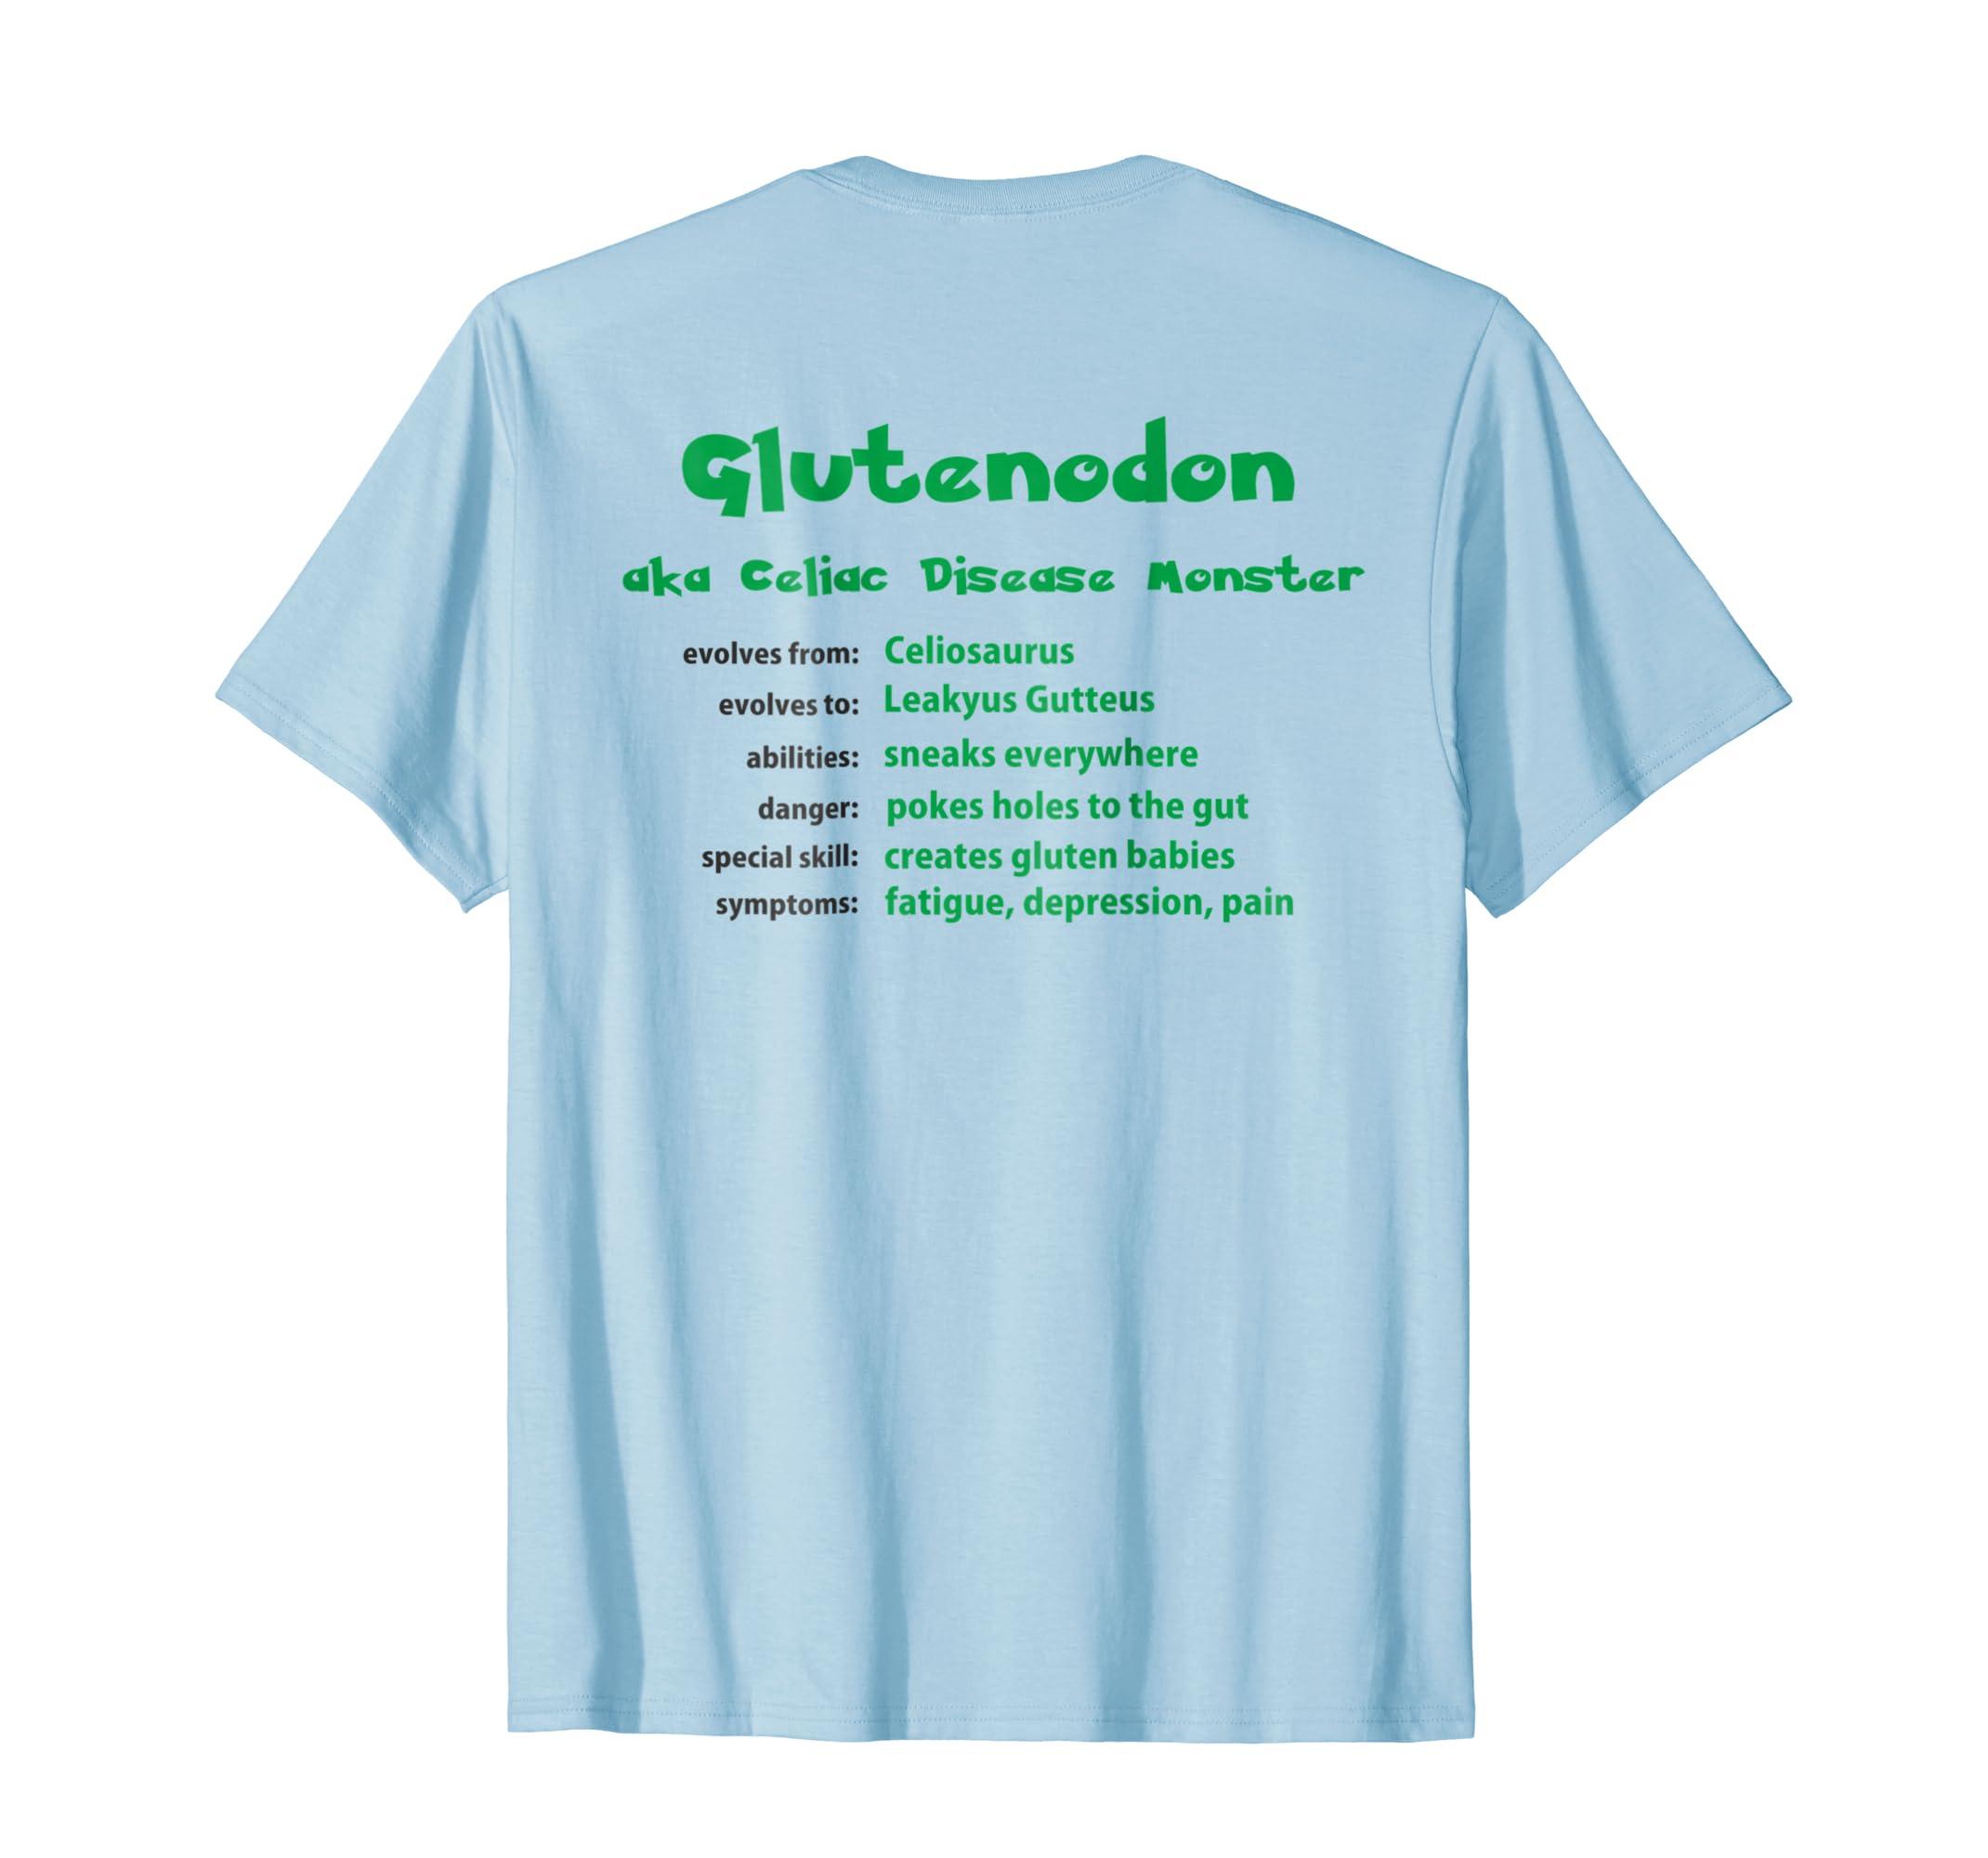 e6a410499 Amazon.com: Celiac Disease Awareness Shirt - Chargimal Glutenodon: Clothing